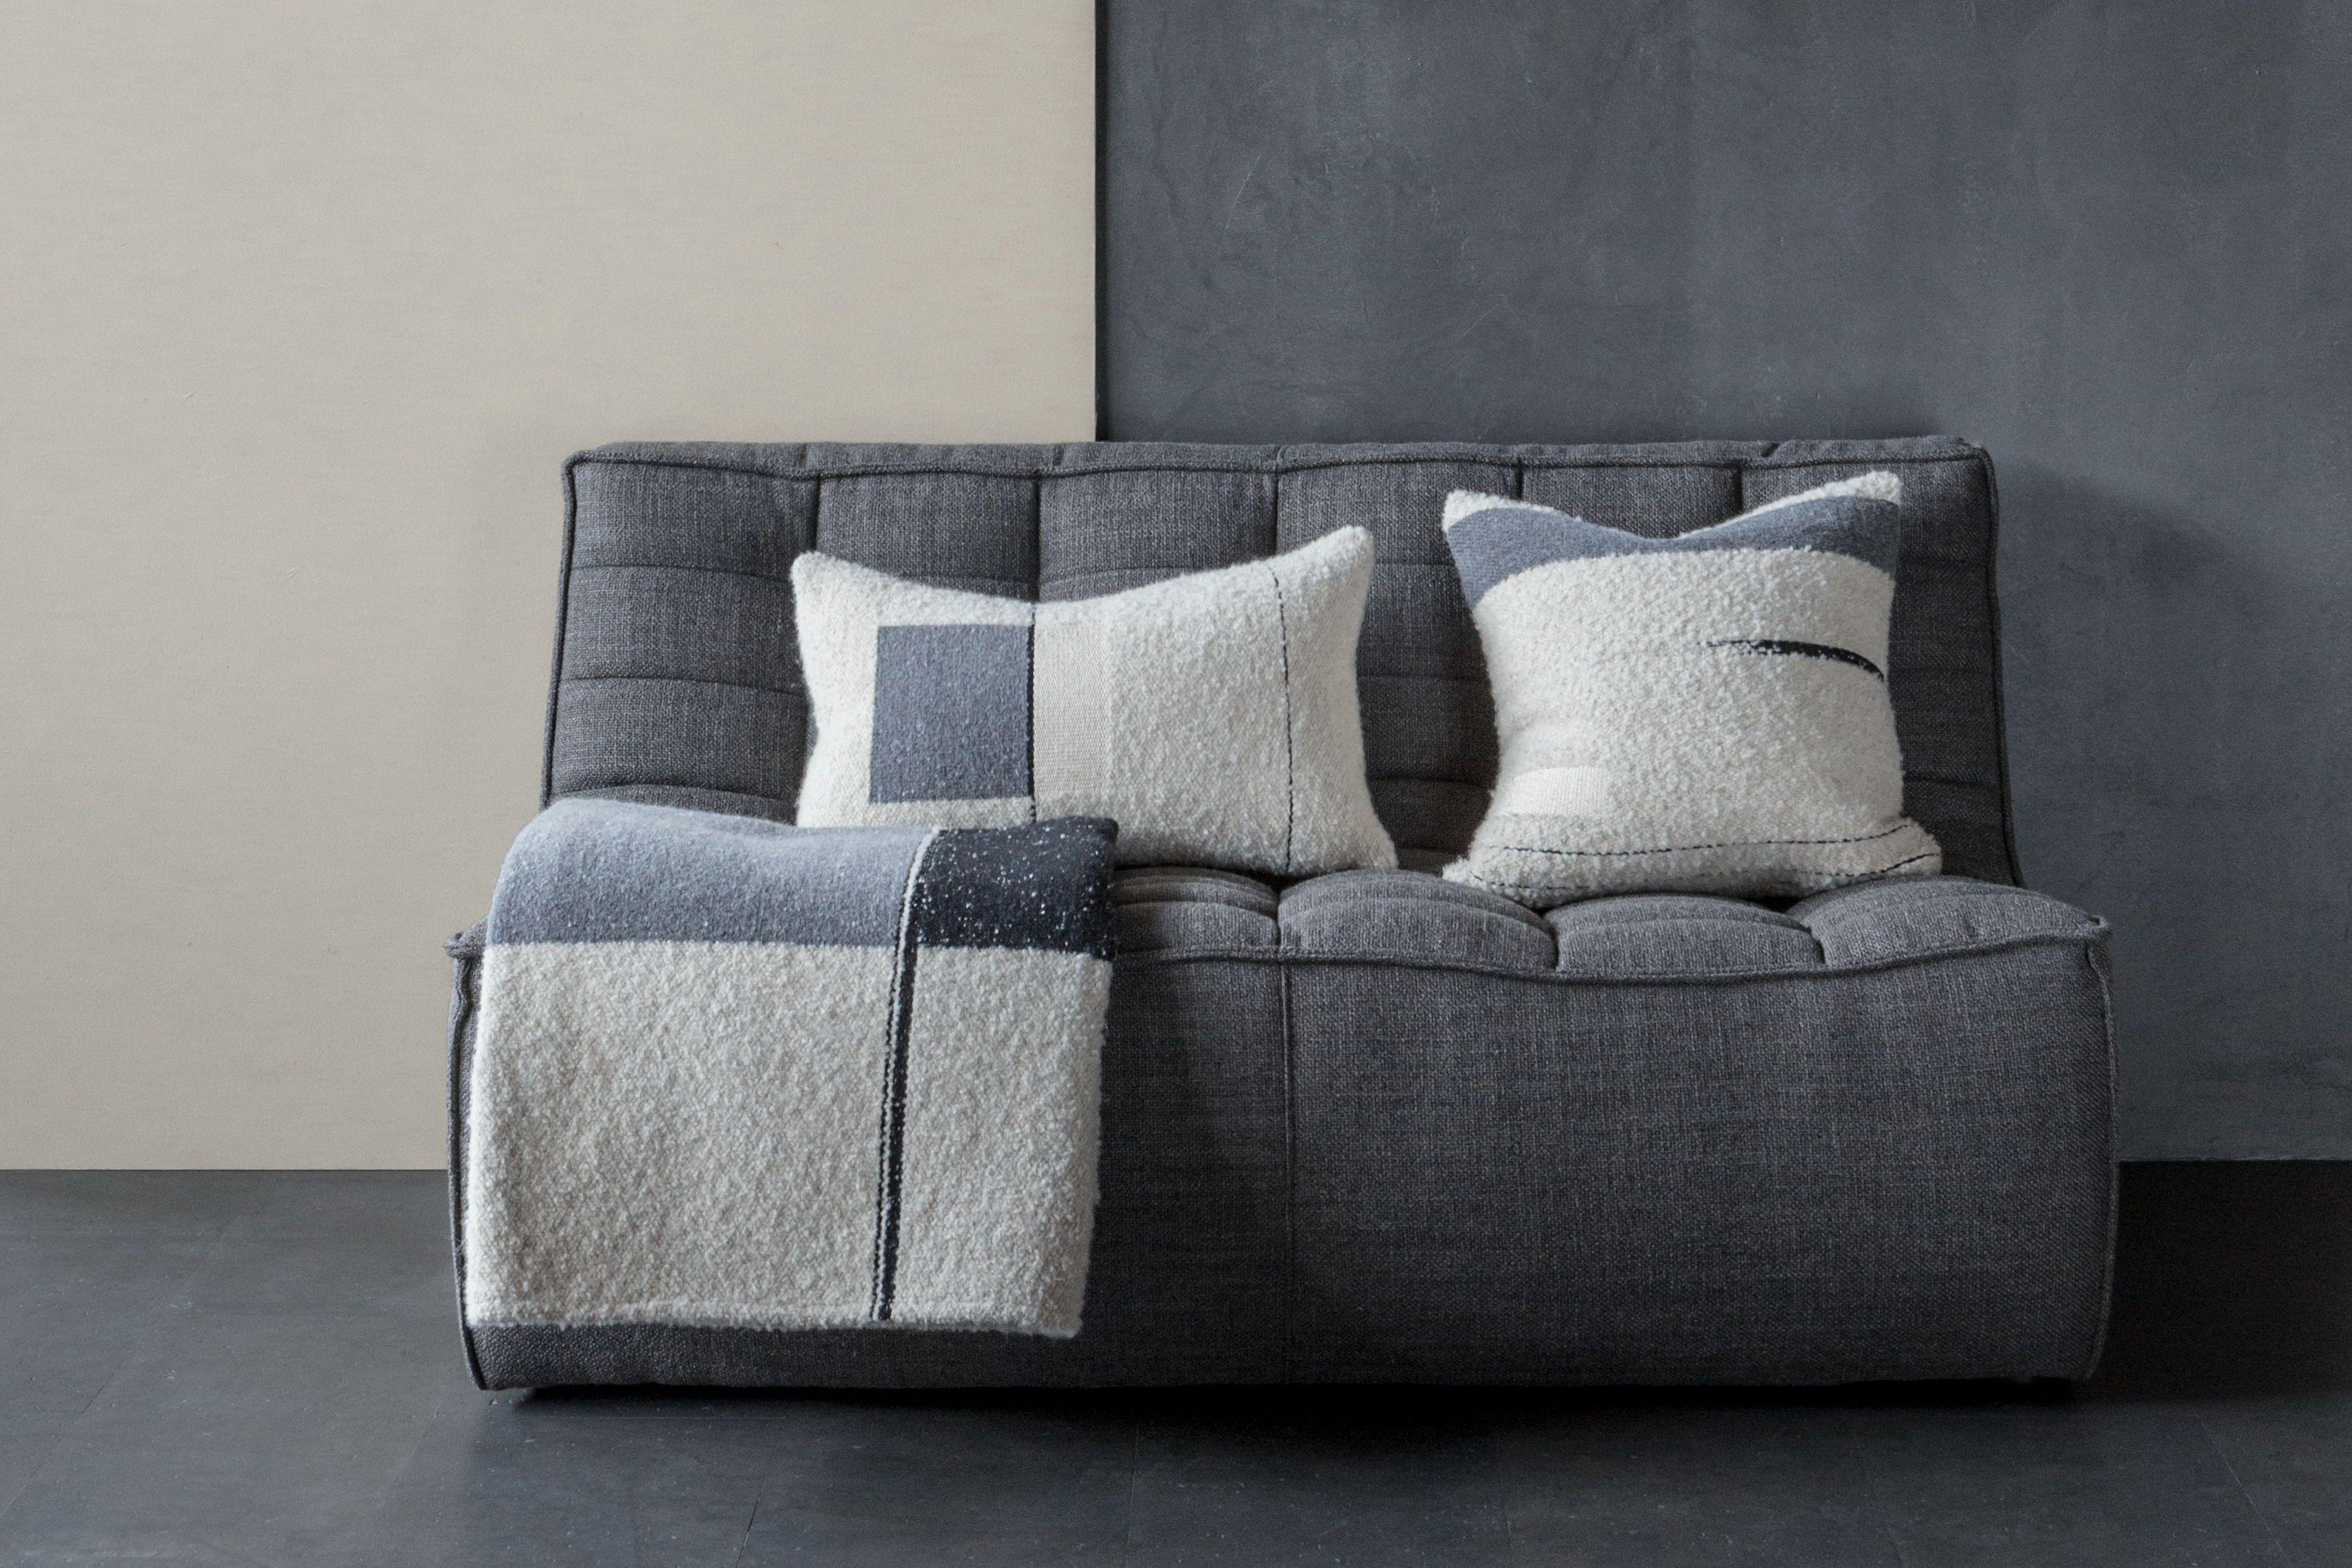 N701 Sectional Sofa Dark Grey In 2020 Sectional Sofa Grey